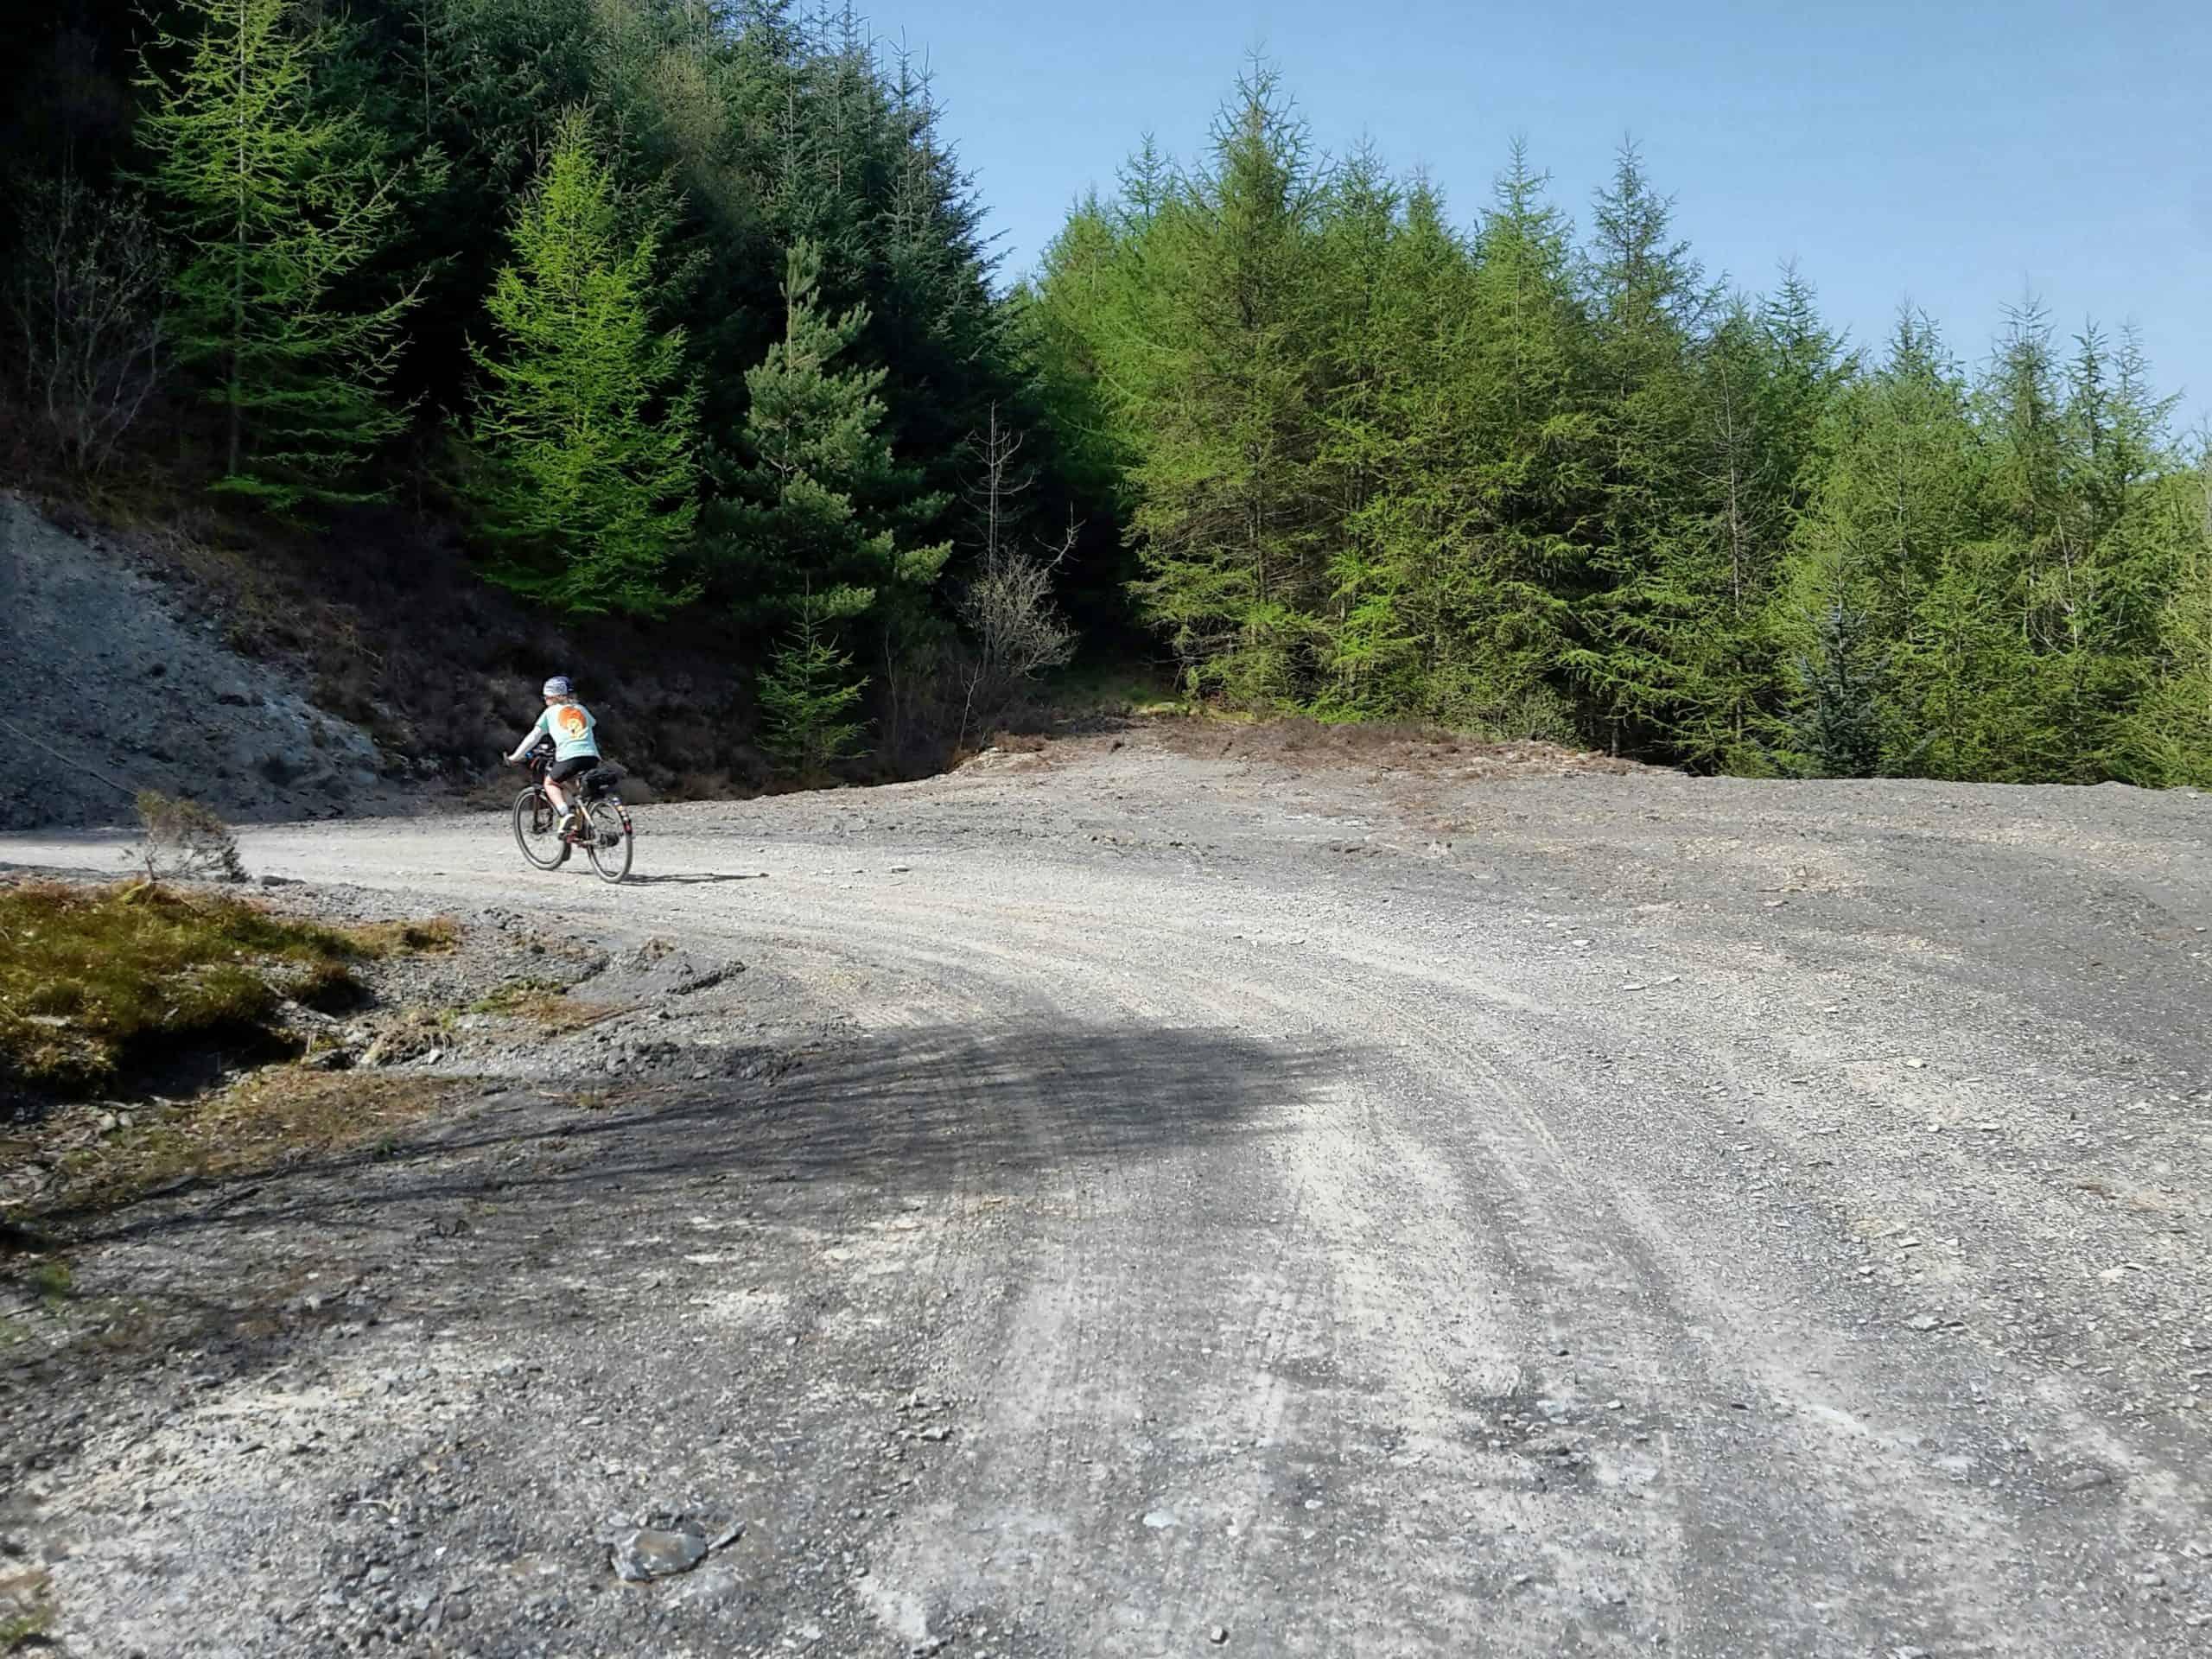 Snowdonia: Climbing Up, Riding Back 81